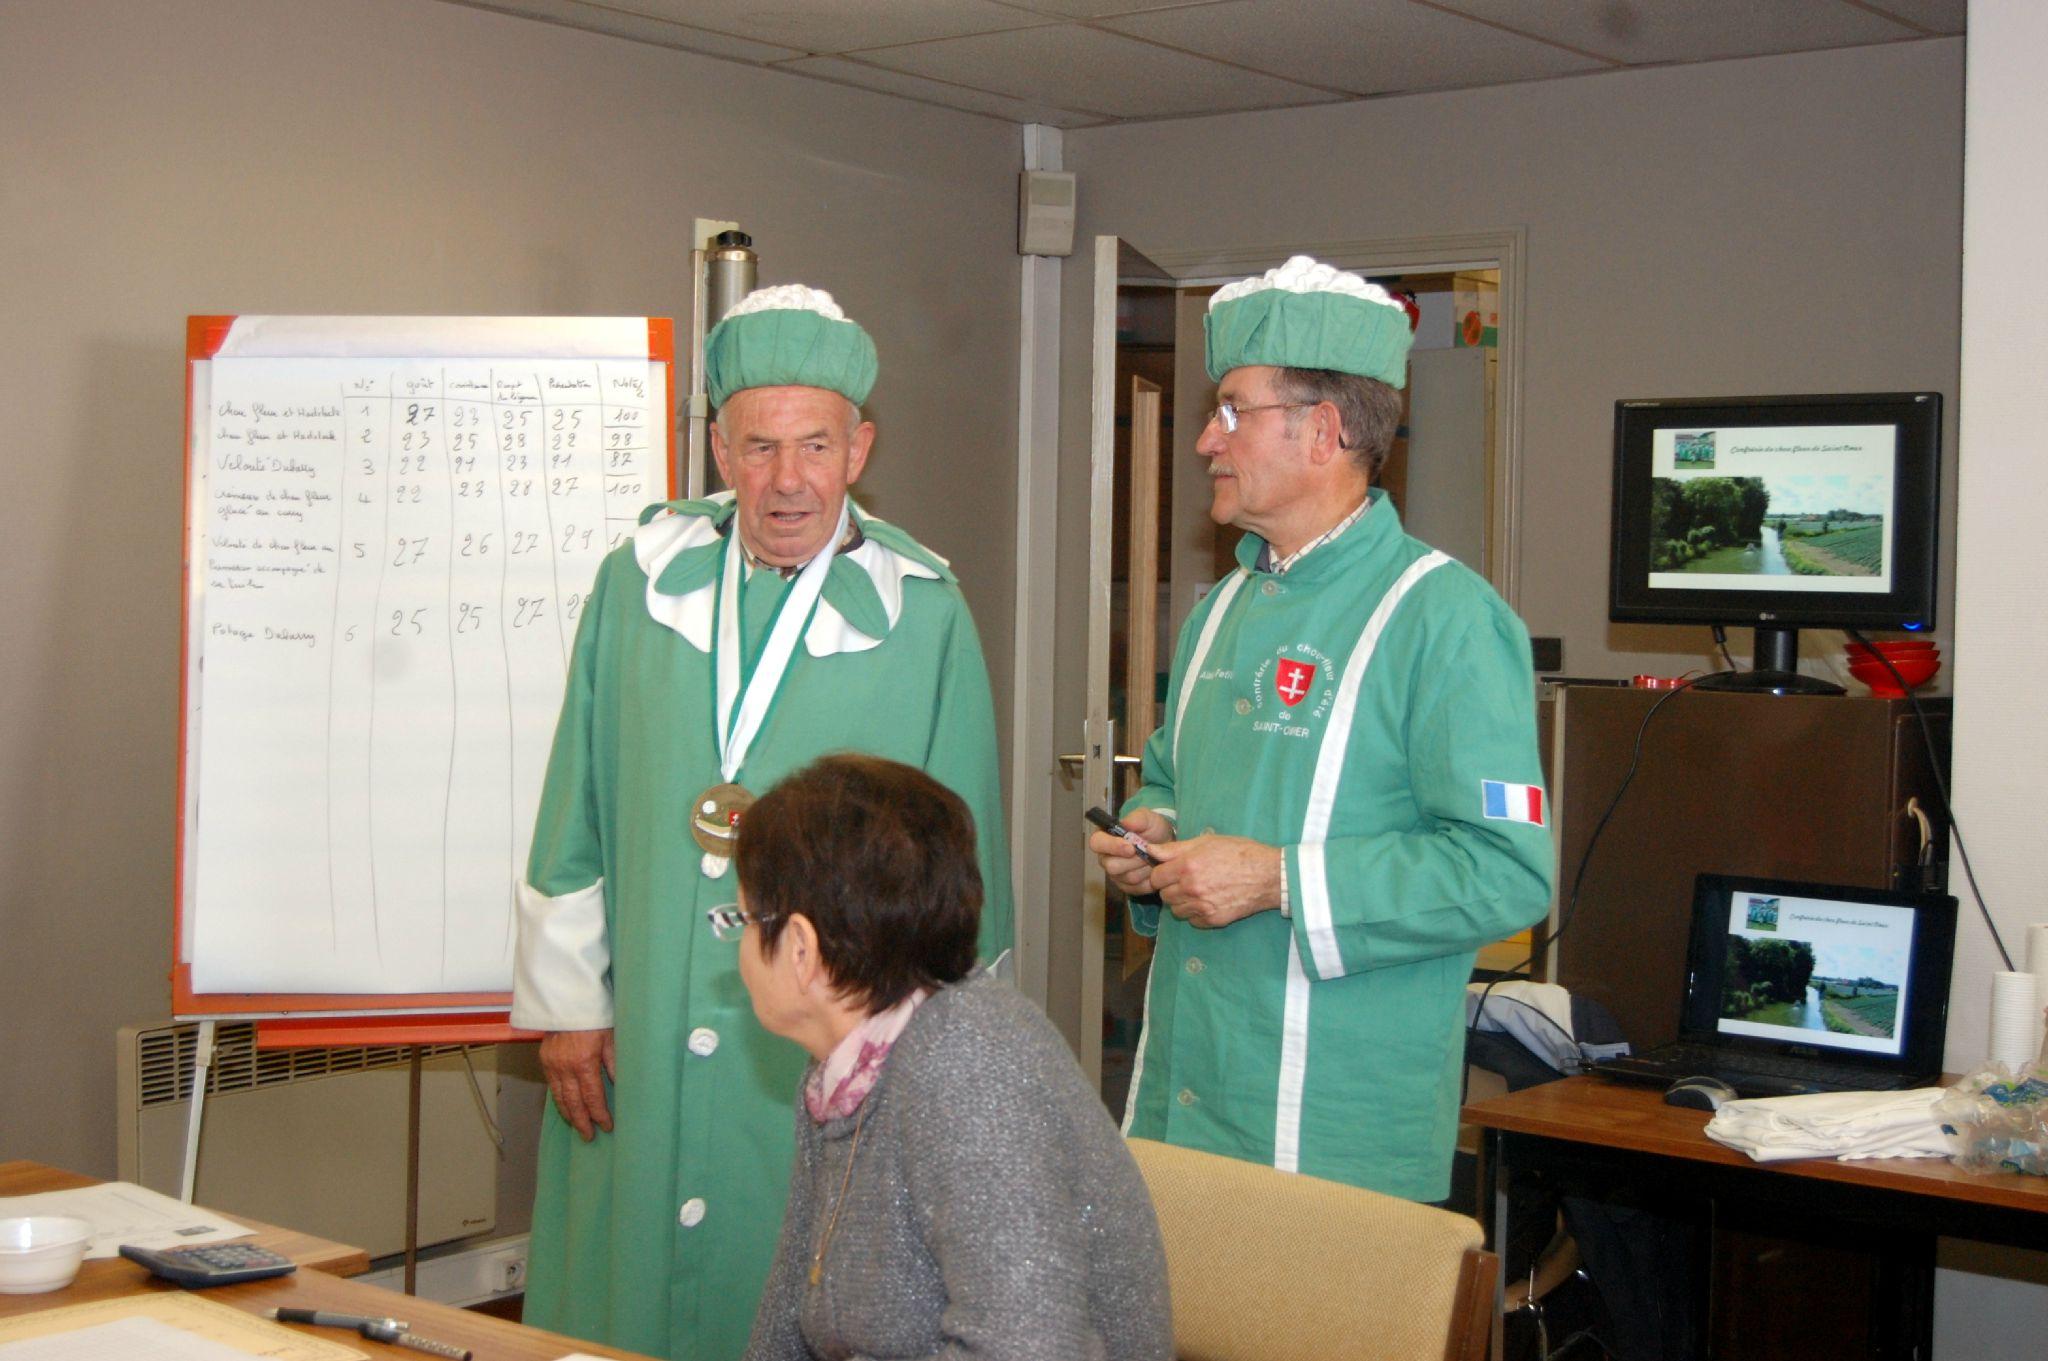 mardi 16 oct 2012 concours de Potage (66)